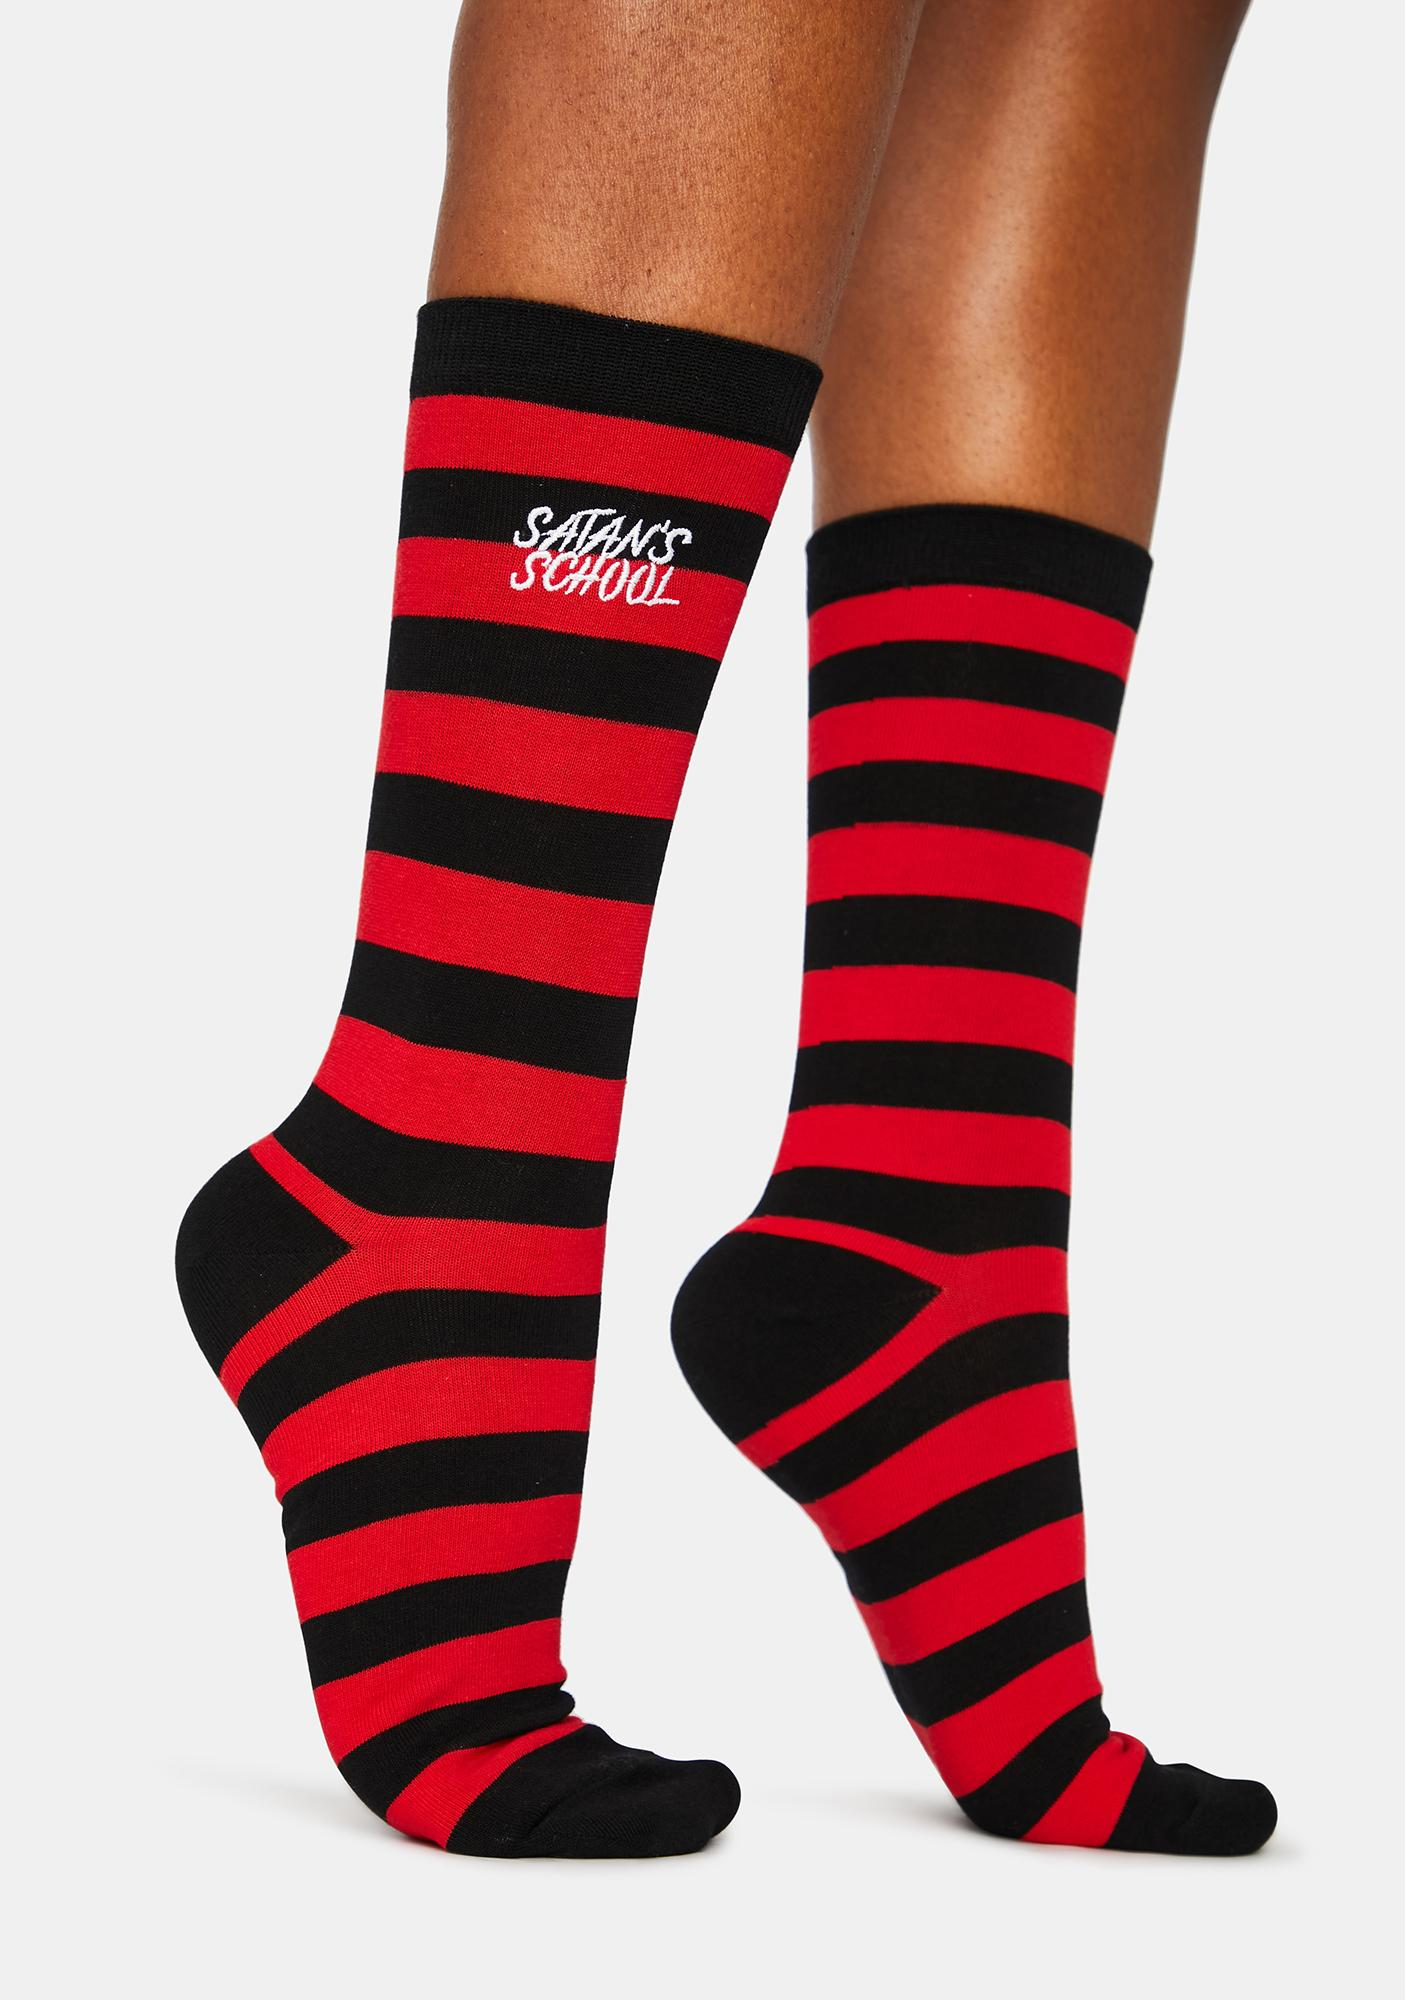 High School Hell Striped Crew Socks